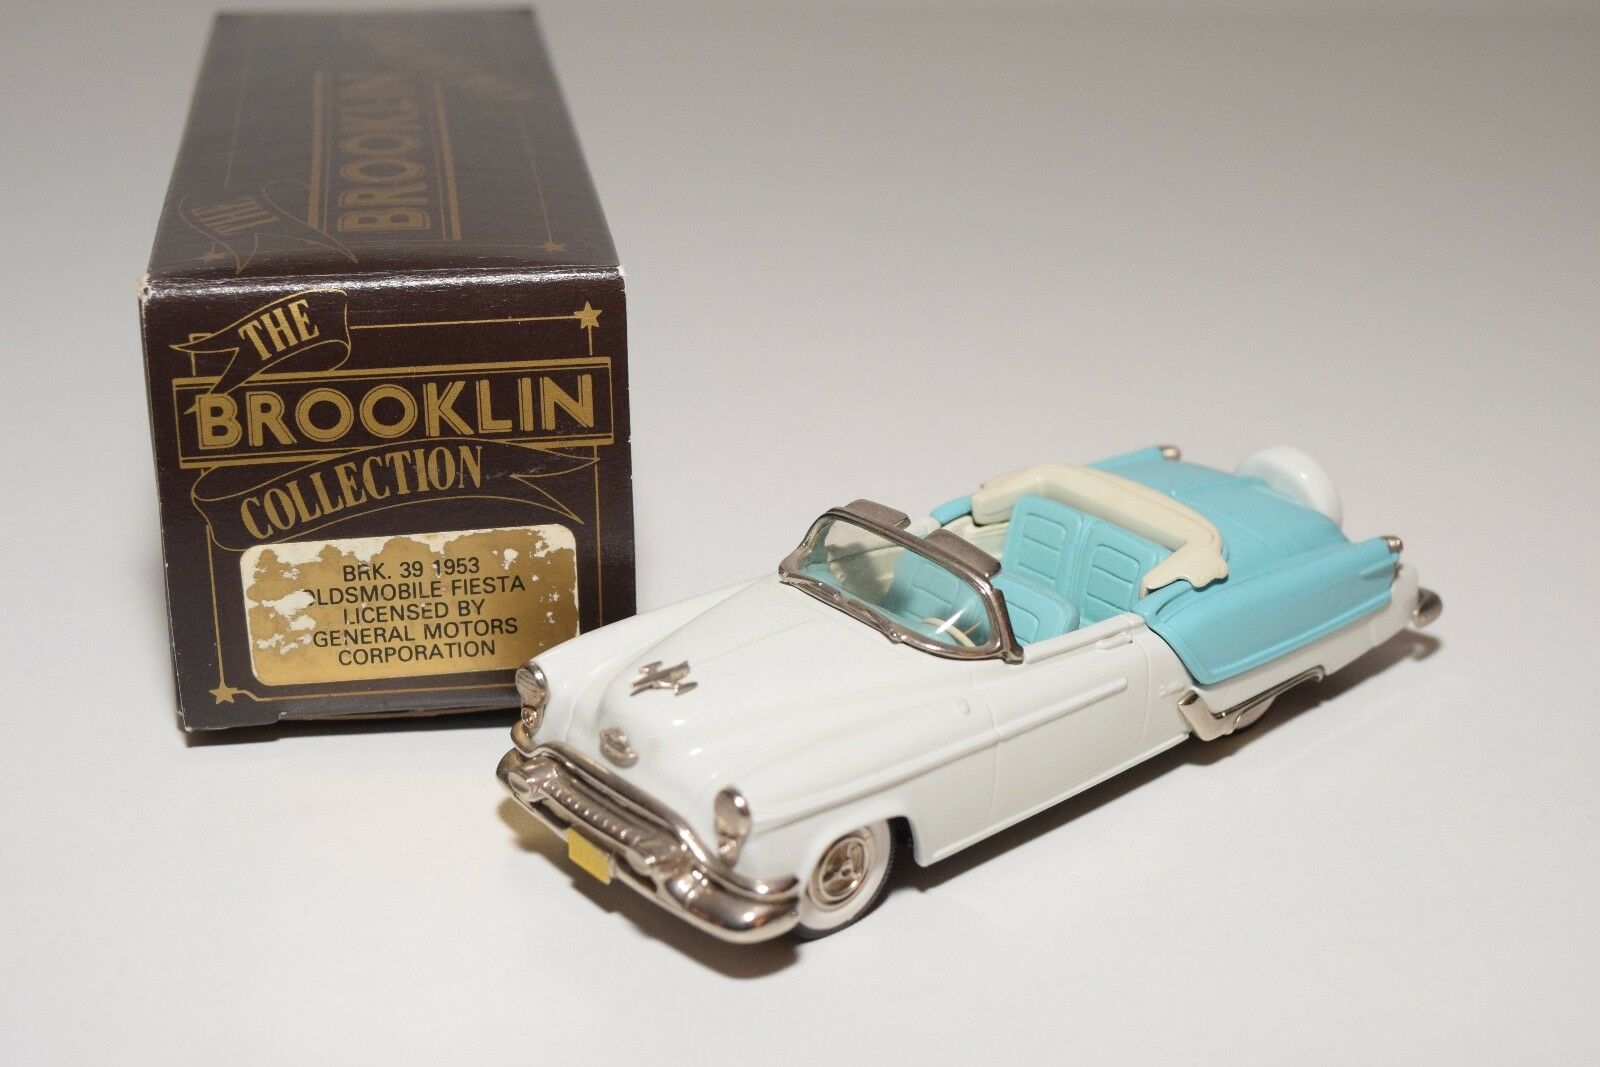 BROOKLIN BRK 39 1953 OLDSMOBILE FIESTA TOP DOWN blanc bleu MINT BOXED